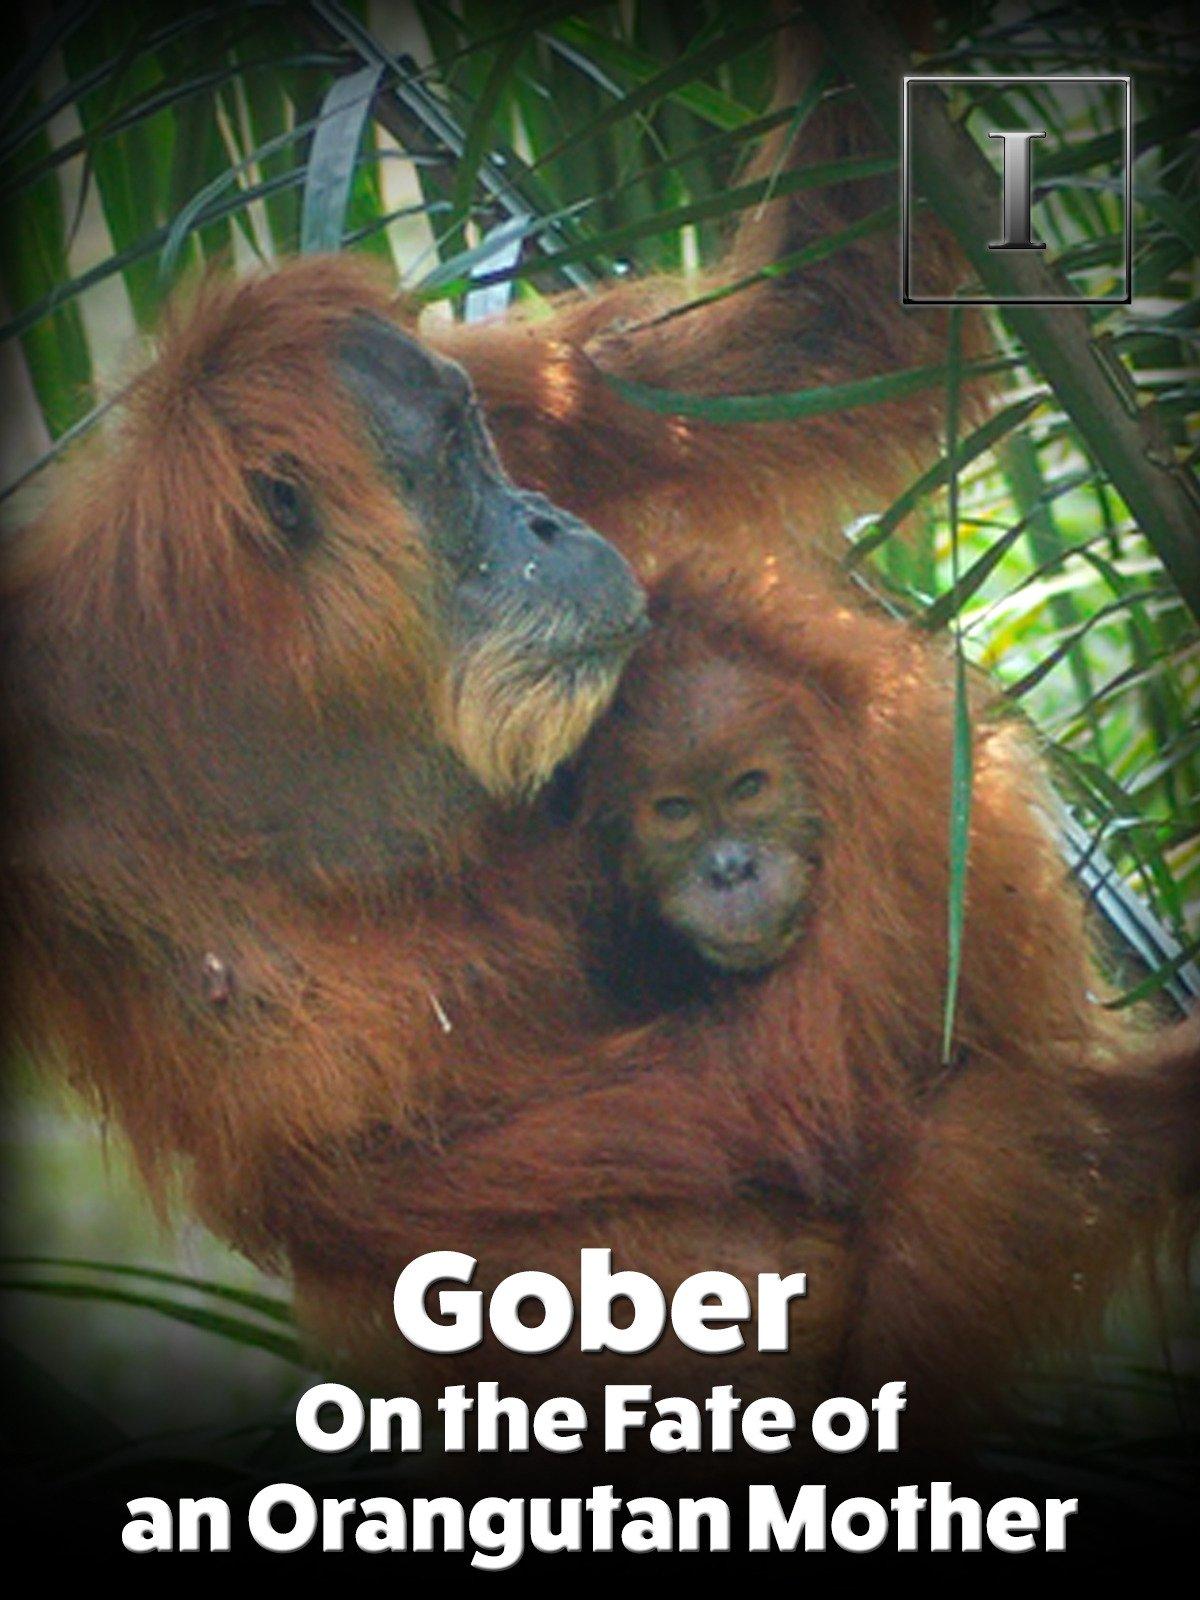 Gober